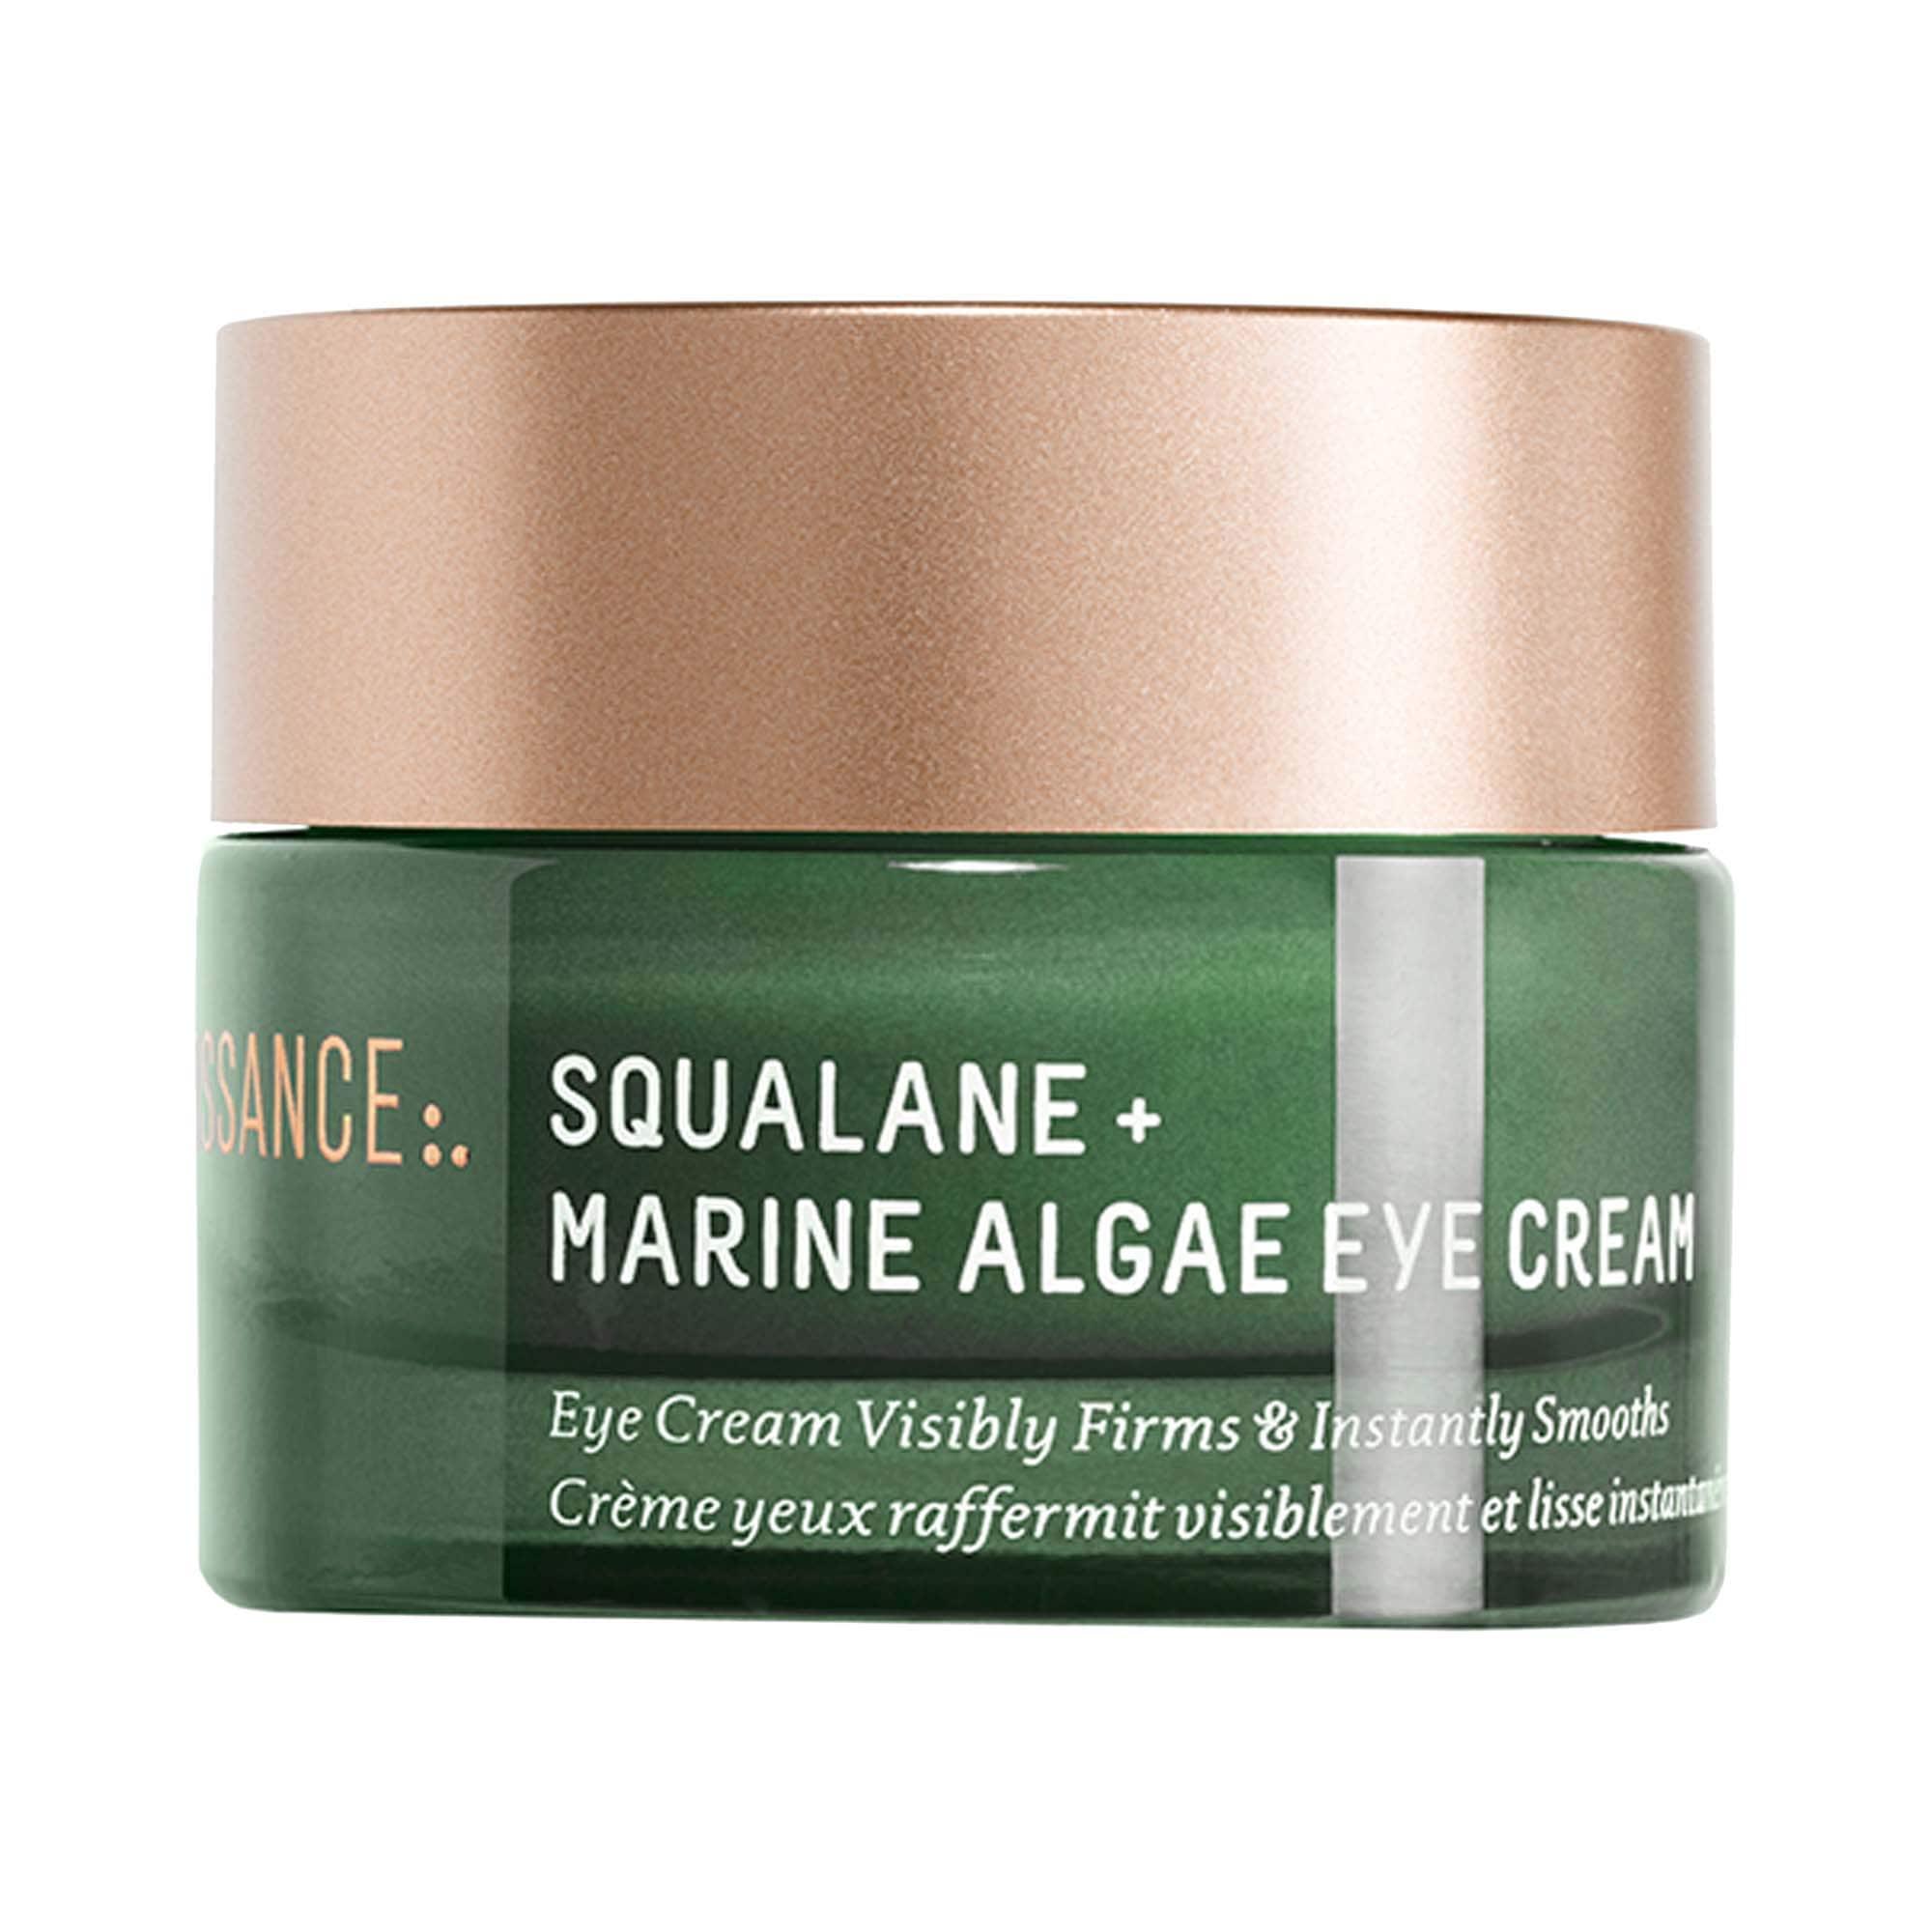 Biossance - Squalane + Marine Algae Eye Cream